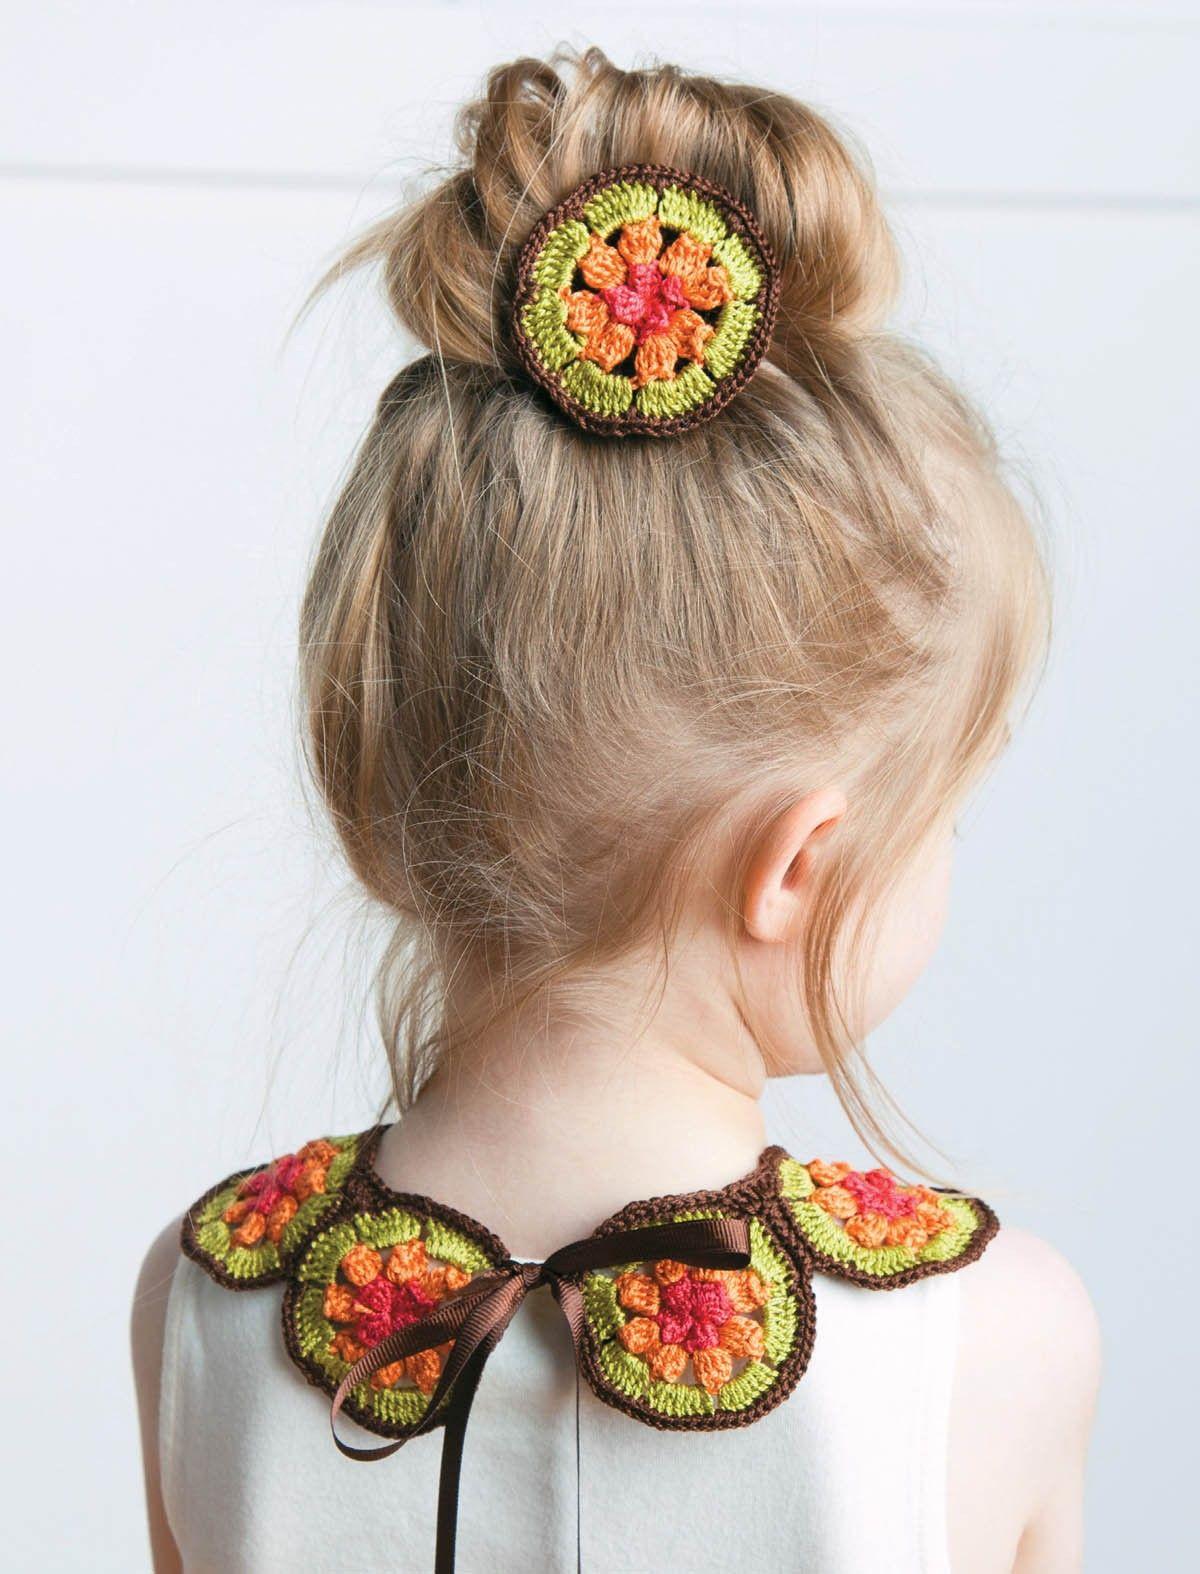 Collars for Kids | LeisureArts.com